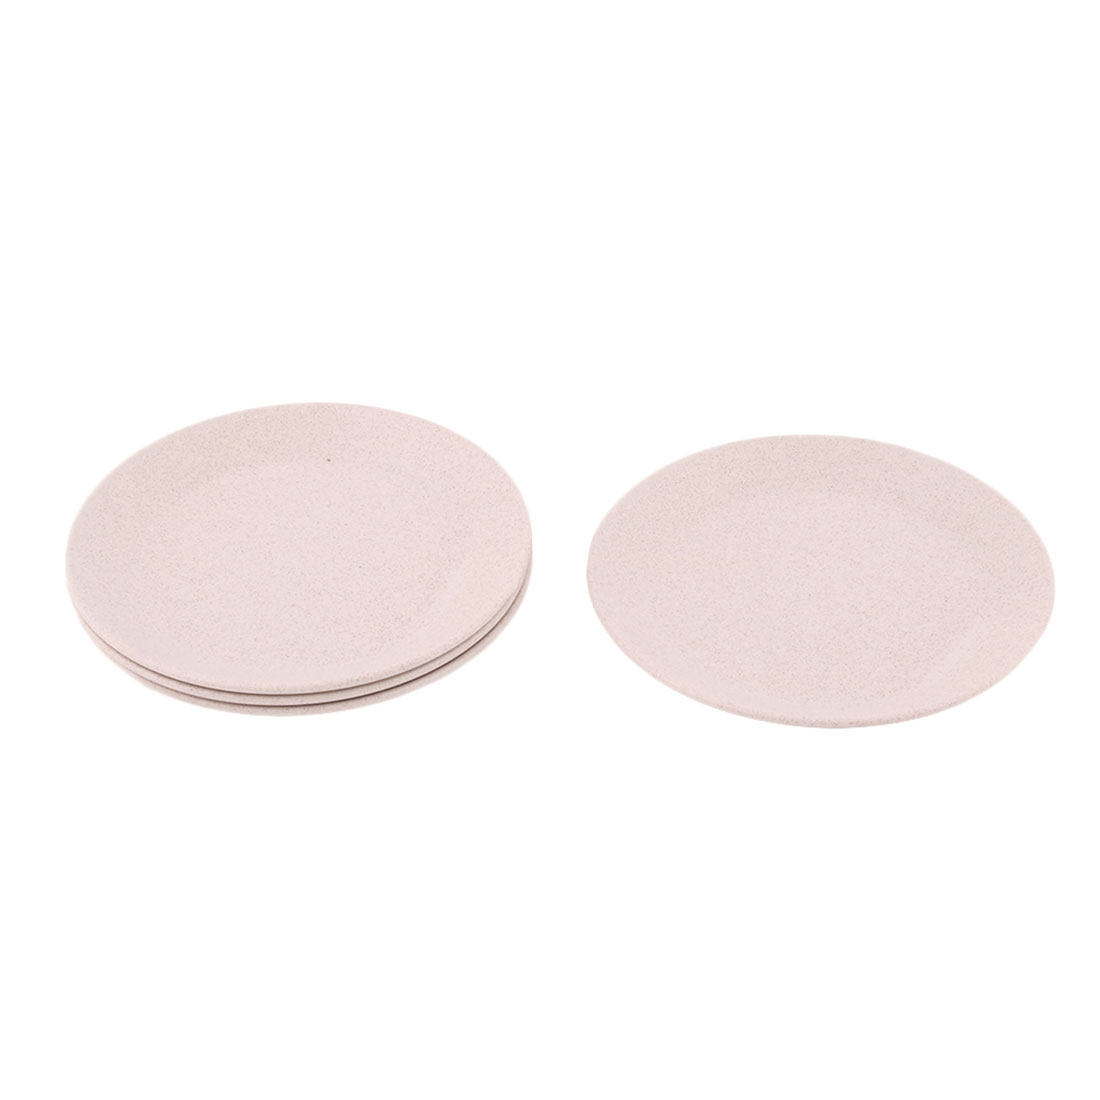 Household Restaurant Round Design Food Snack Dessert Dish Plate Beige 4 Pcs by